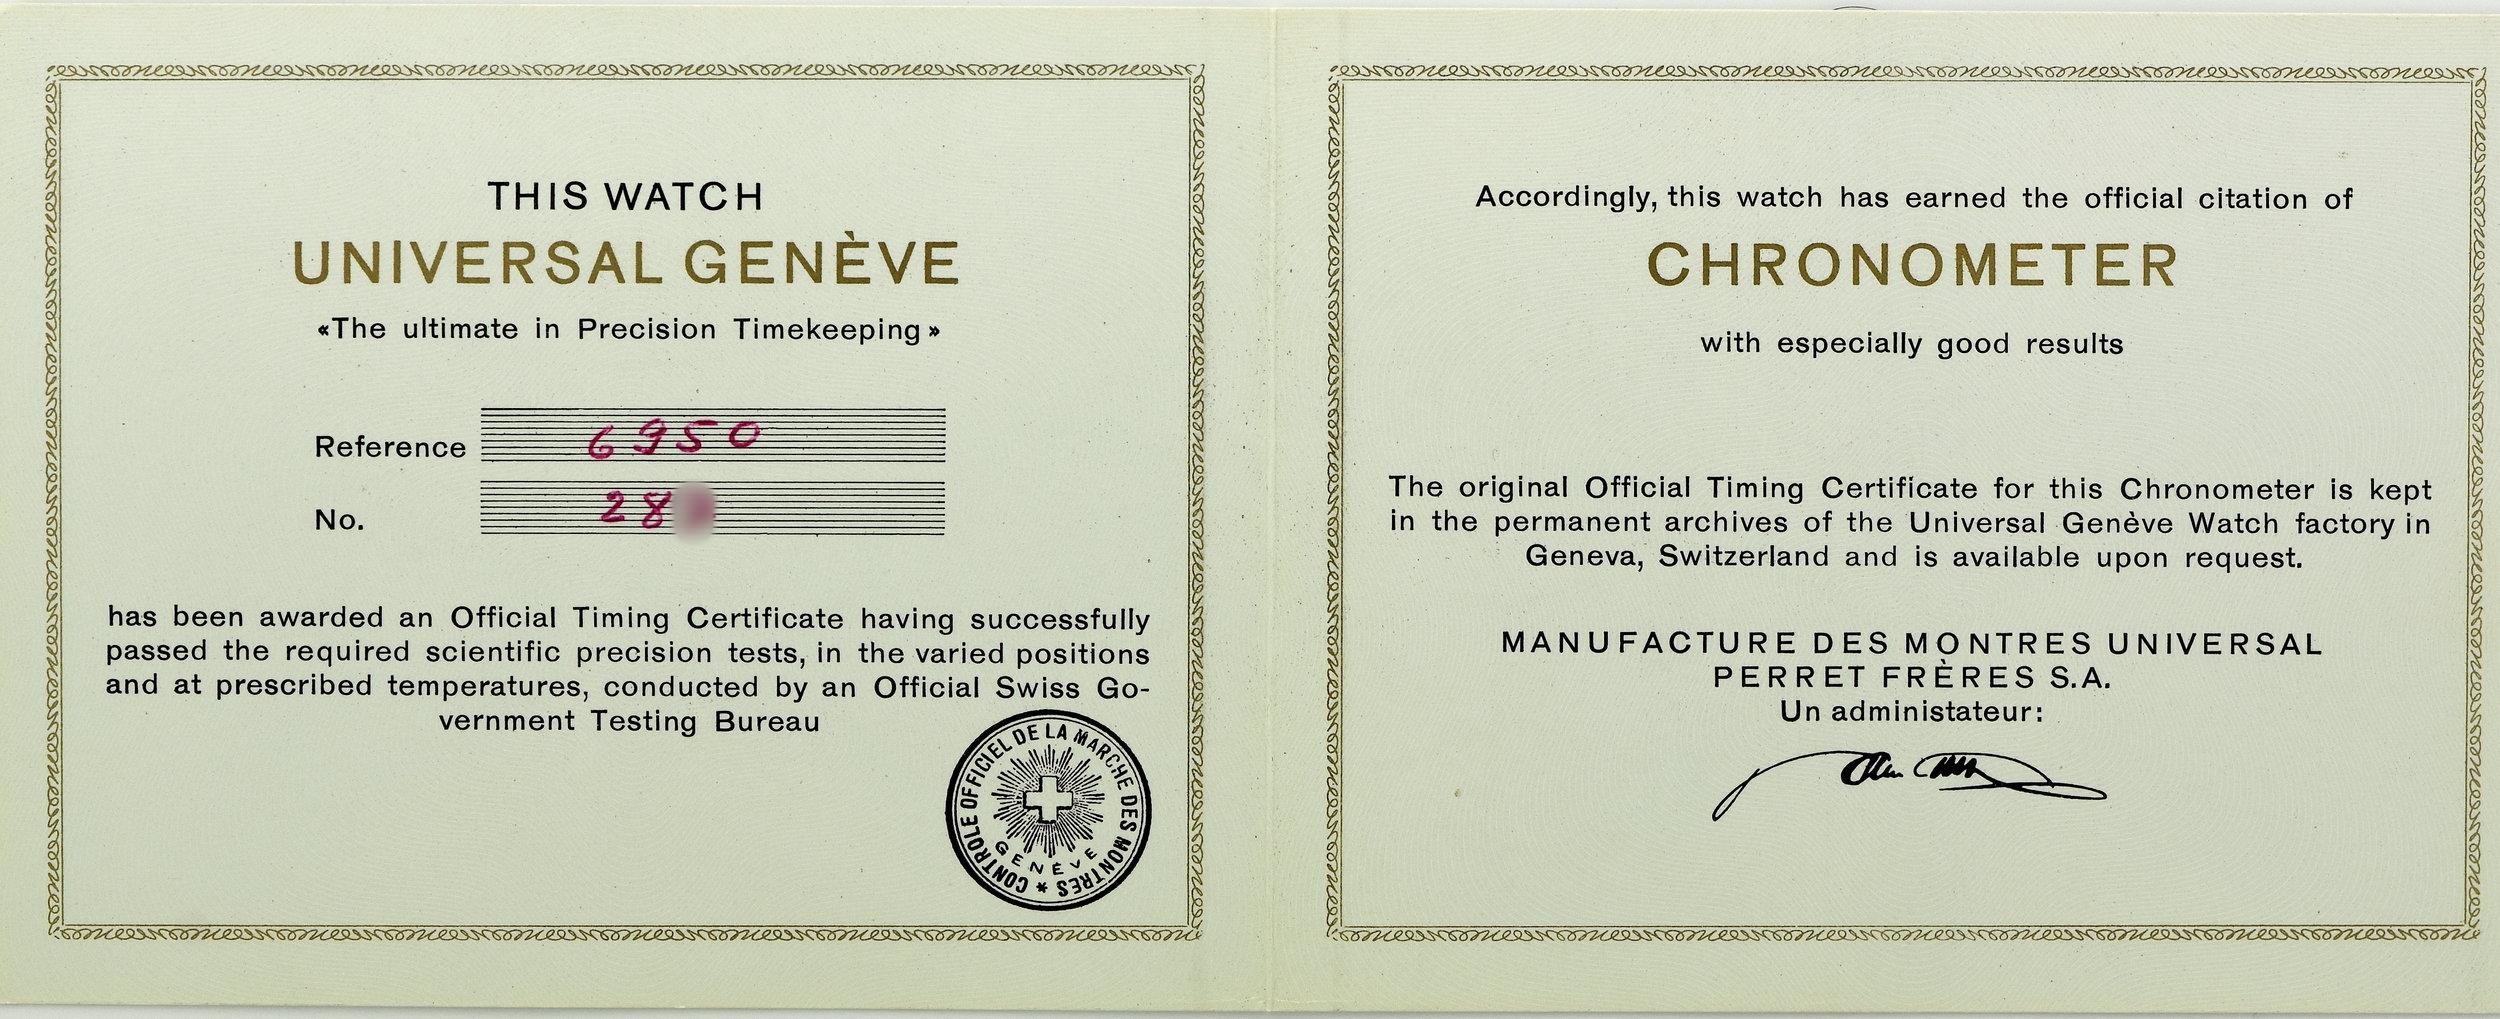 Chronometer-certificate-universal-geneve